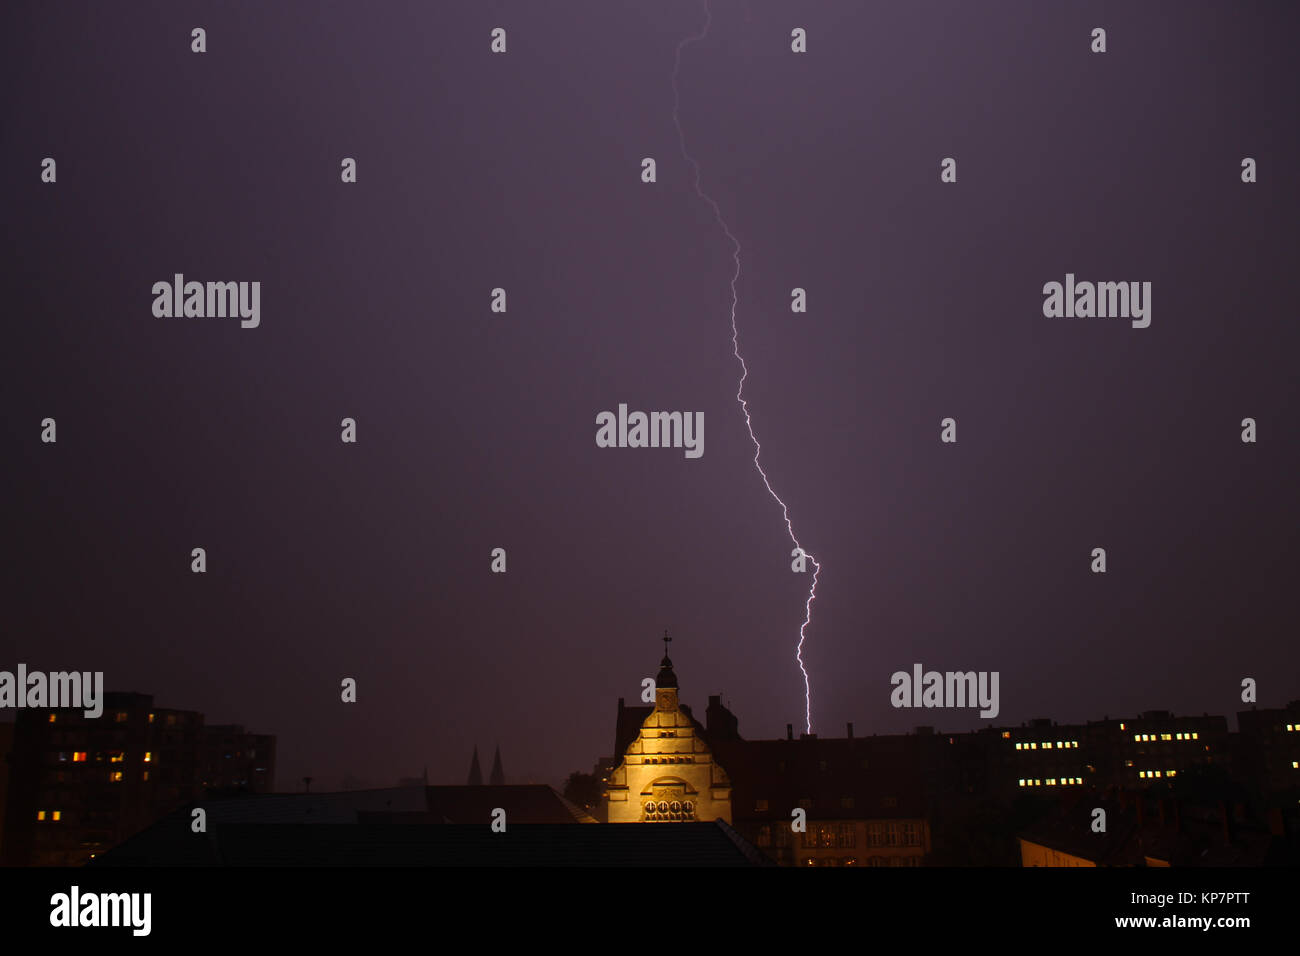 flashes on the horizon - Stock Image